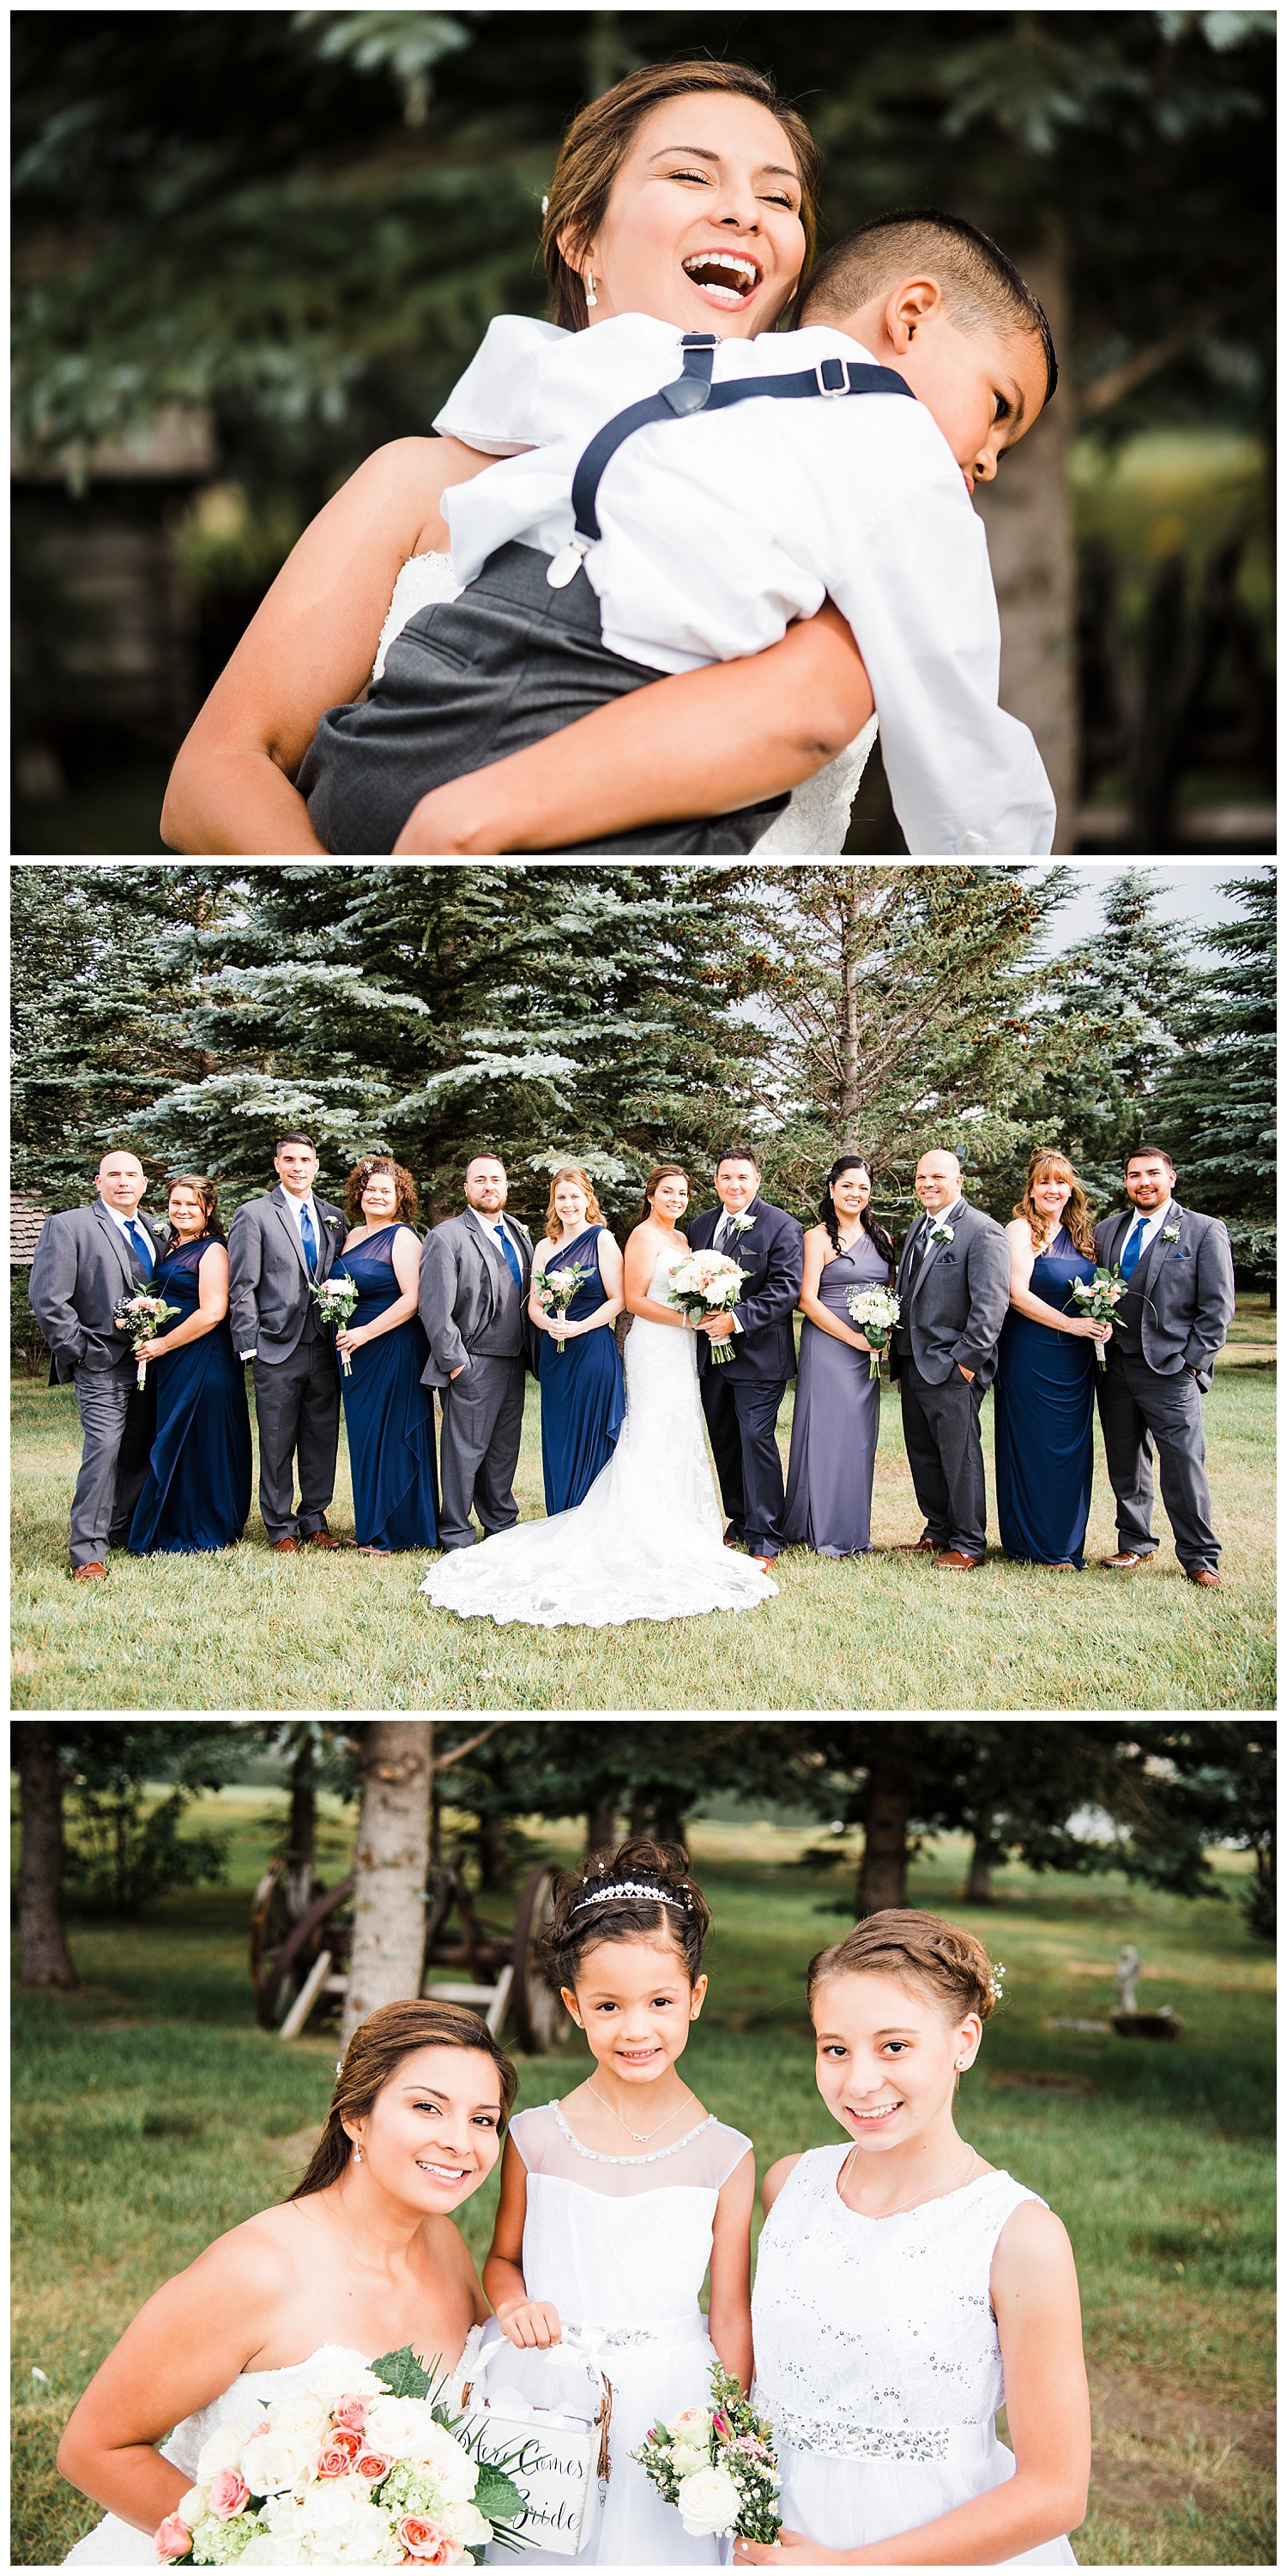 The_Barn_At_Evergreen_Memorial_Park_Wedding_Apollo_Fields_122.jpg